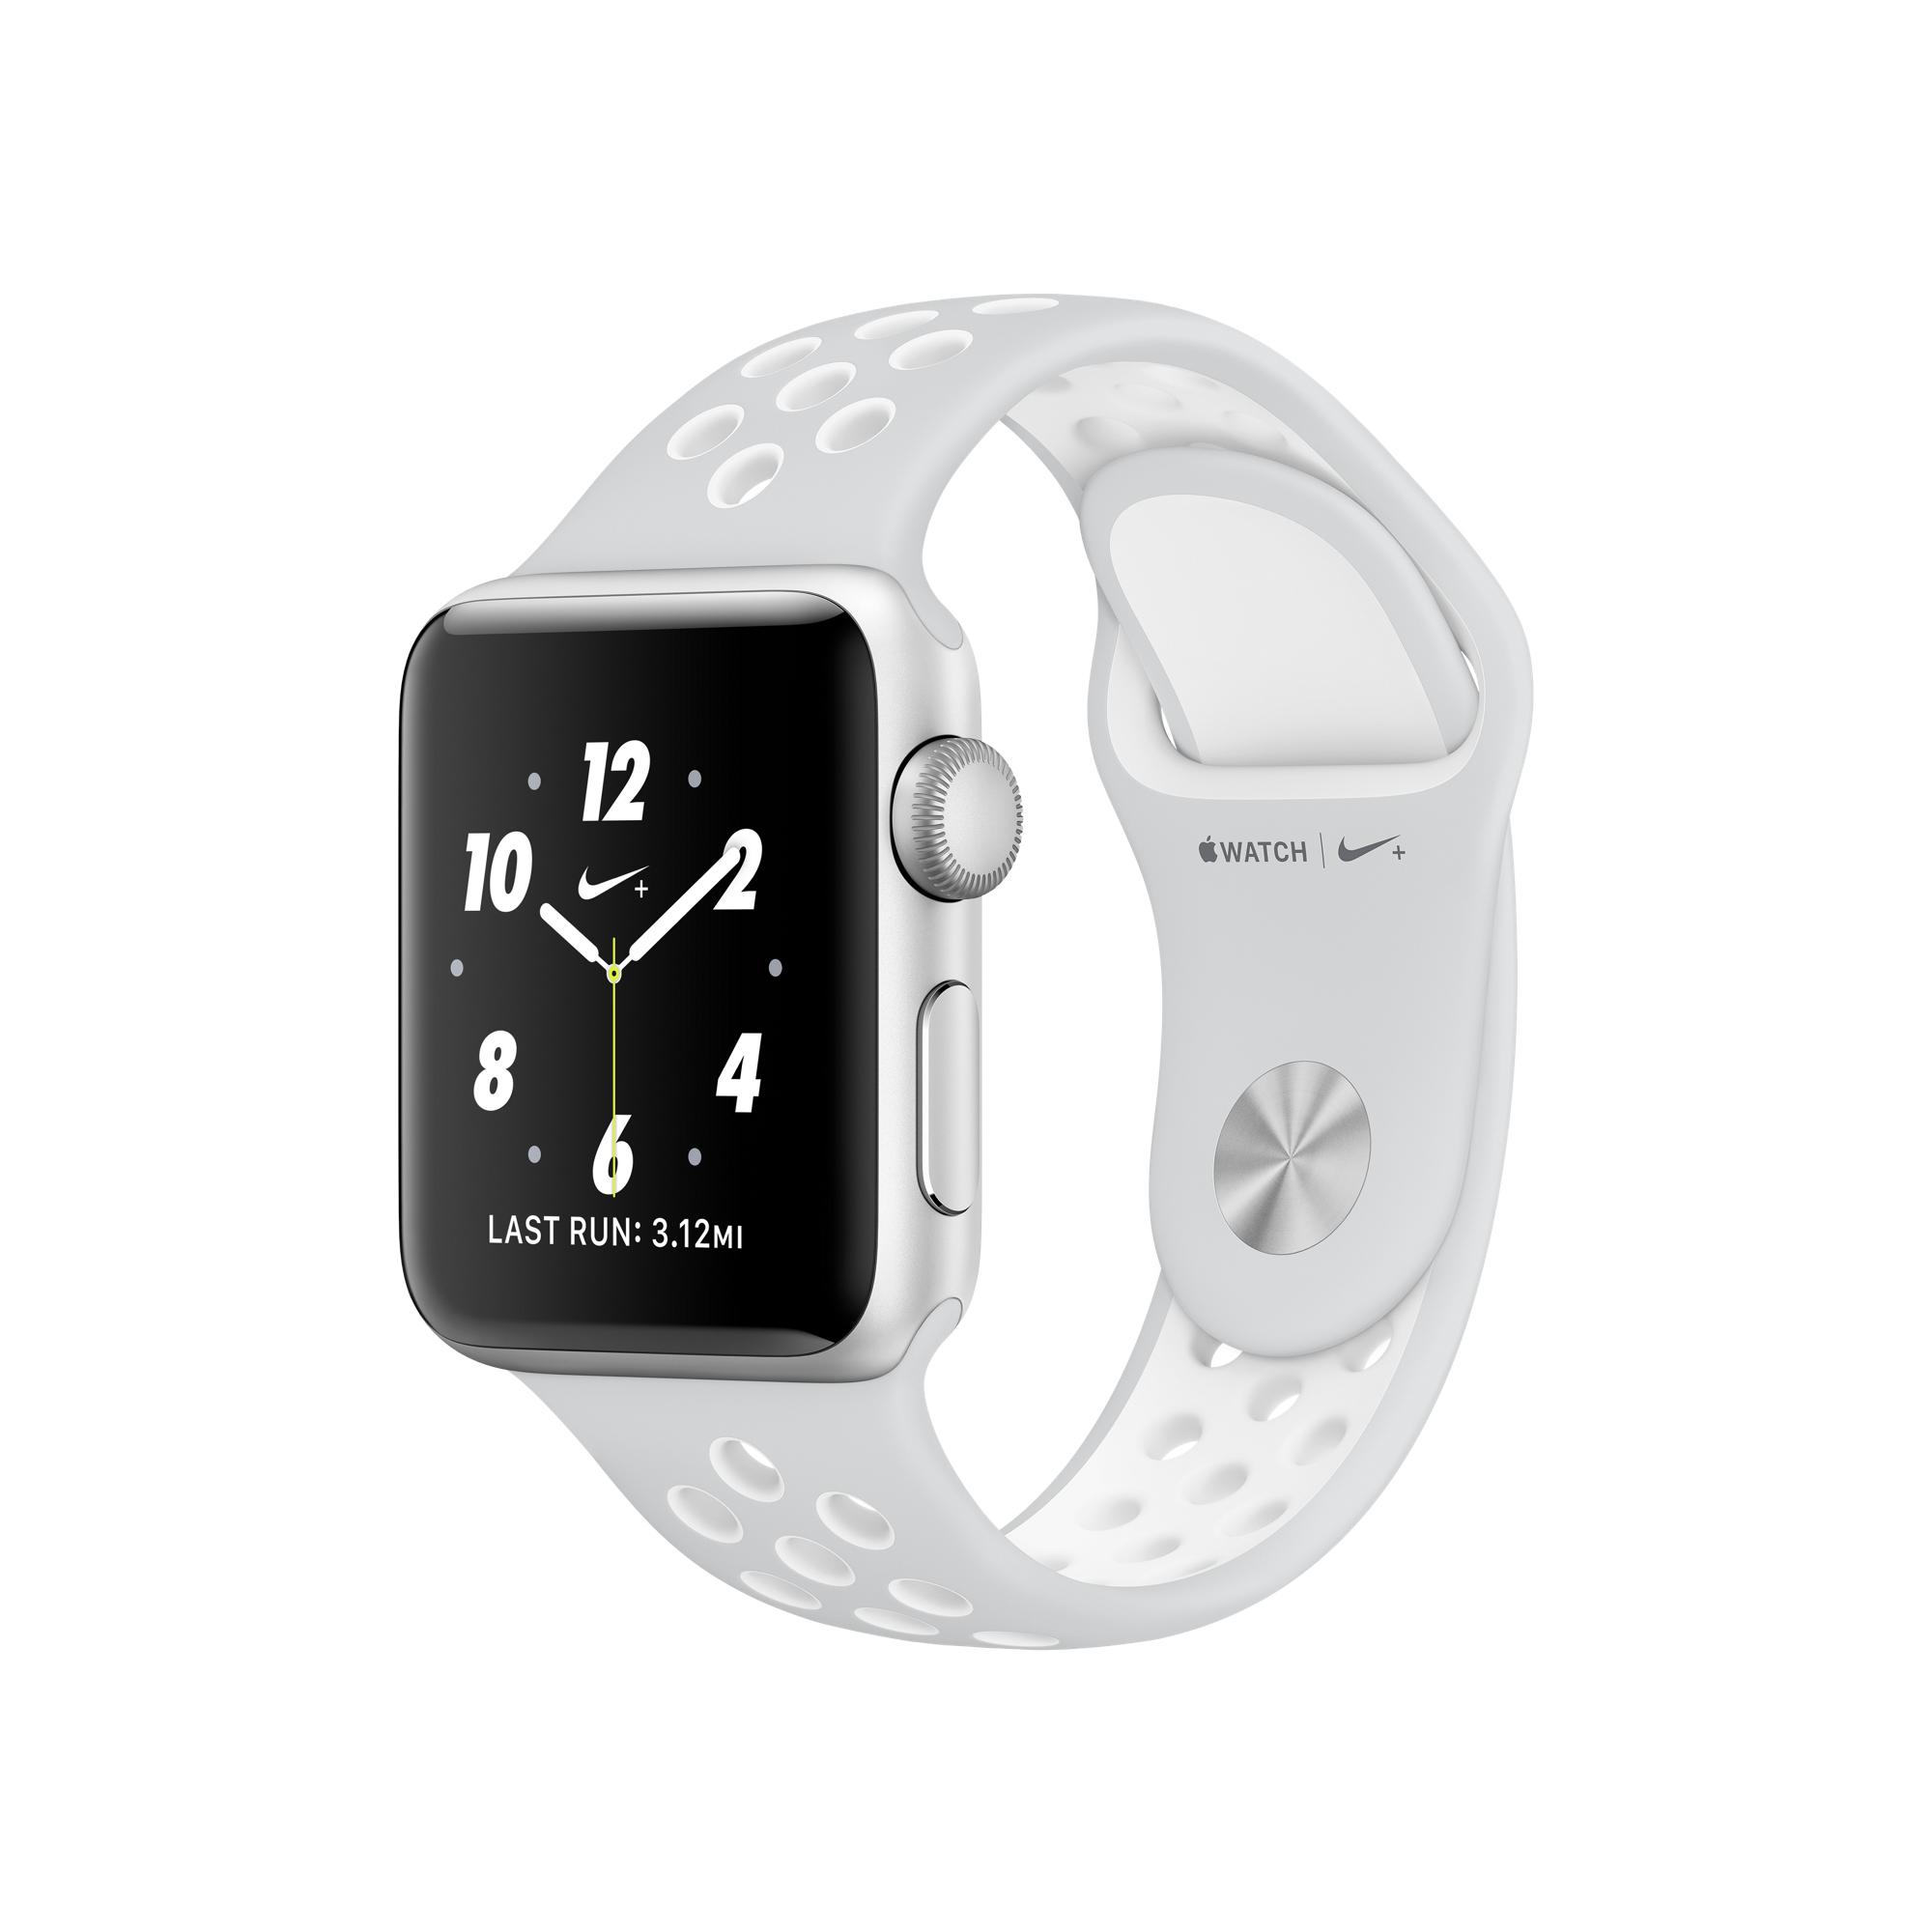 Apple Watch Nike+ OLED 28.2g Silver smartwatch